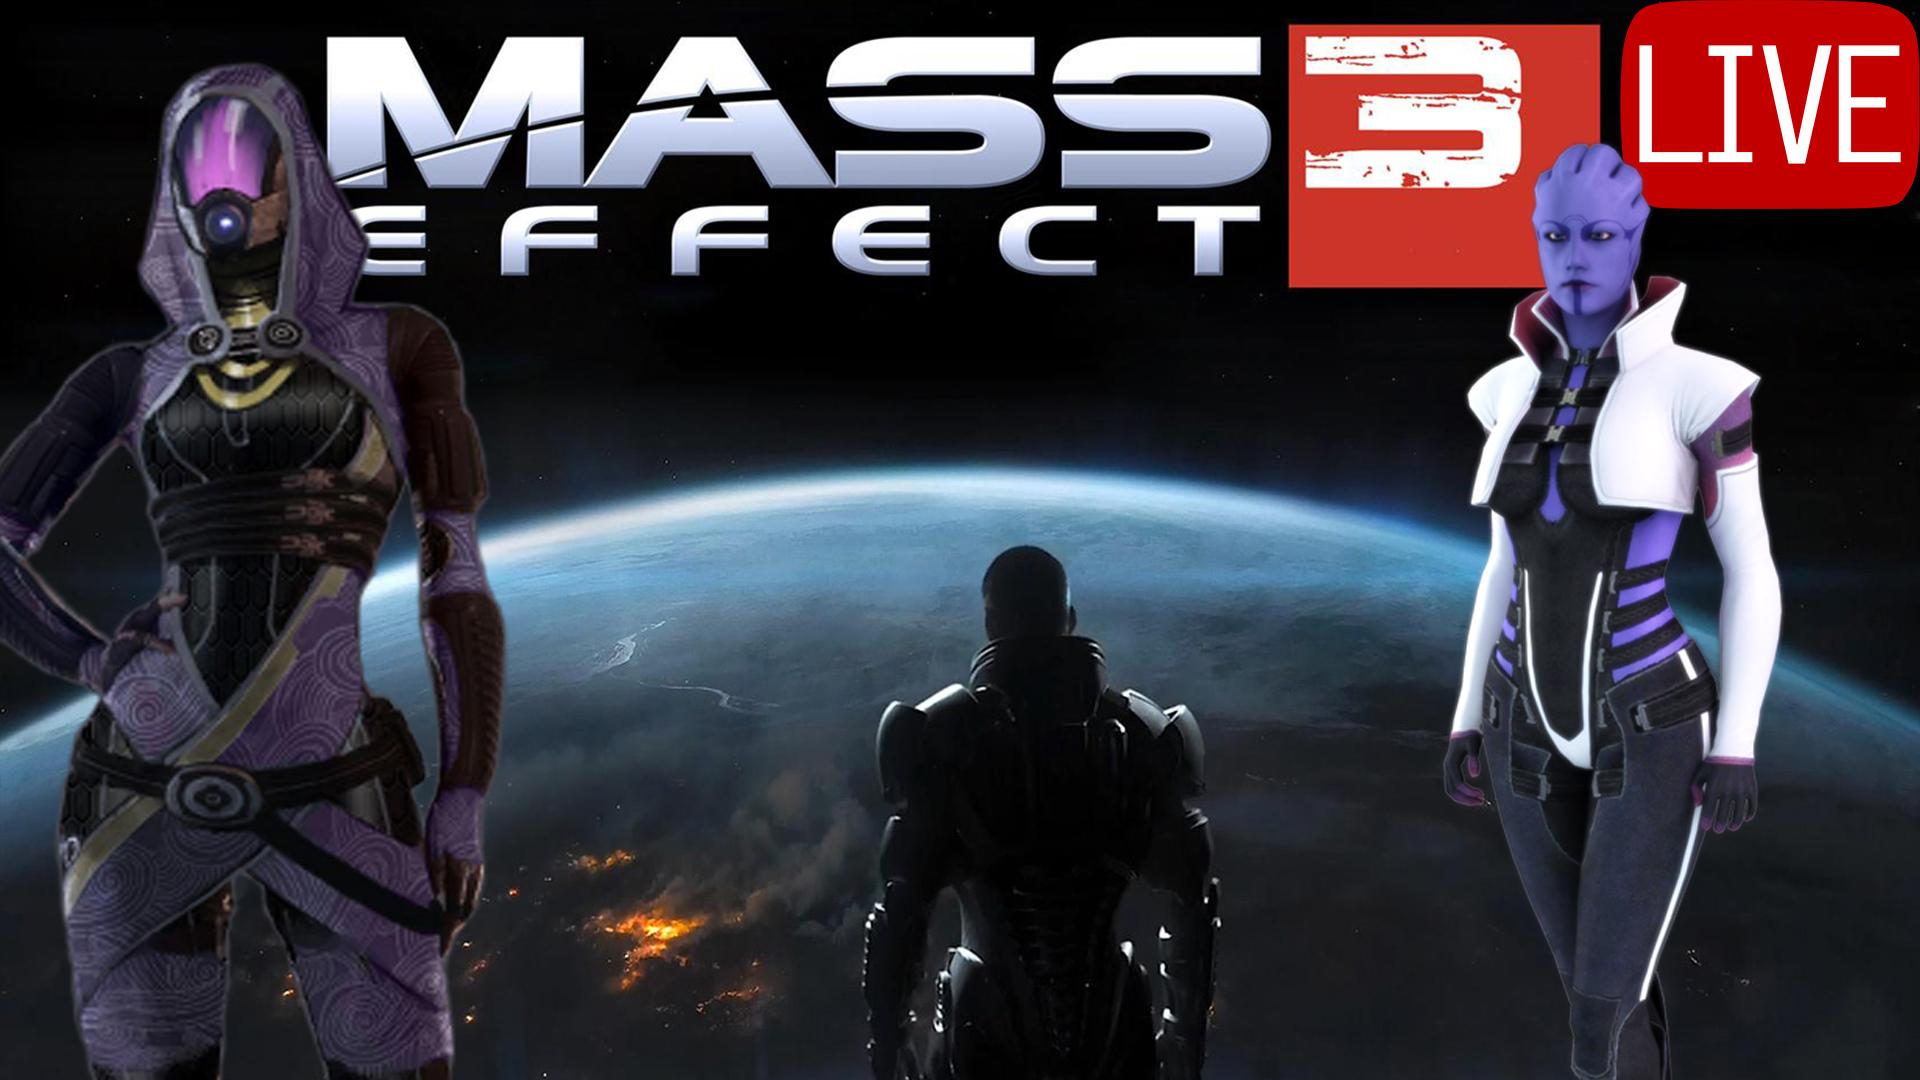 Mass Effect 3 Thumbnail Live Tali & Aria